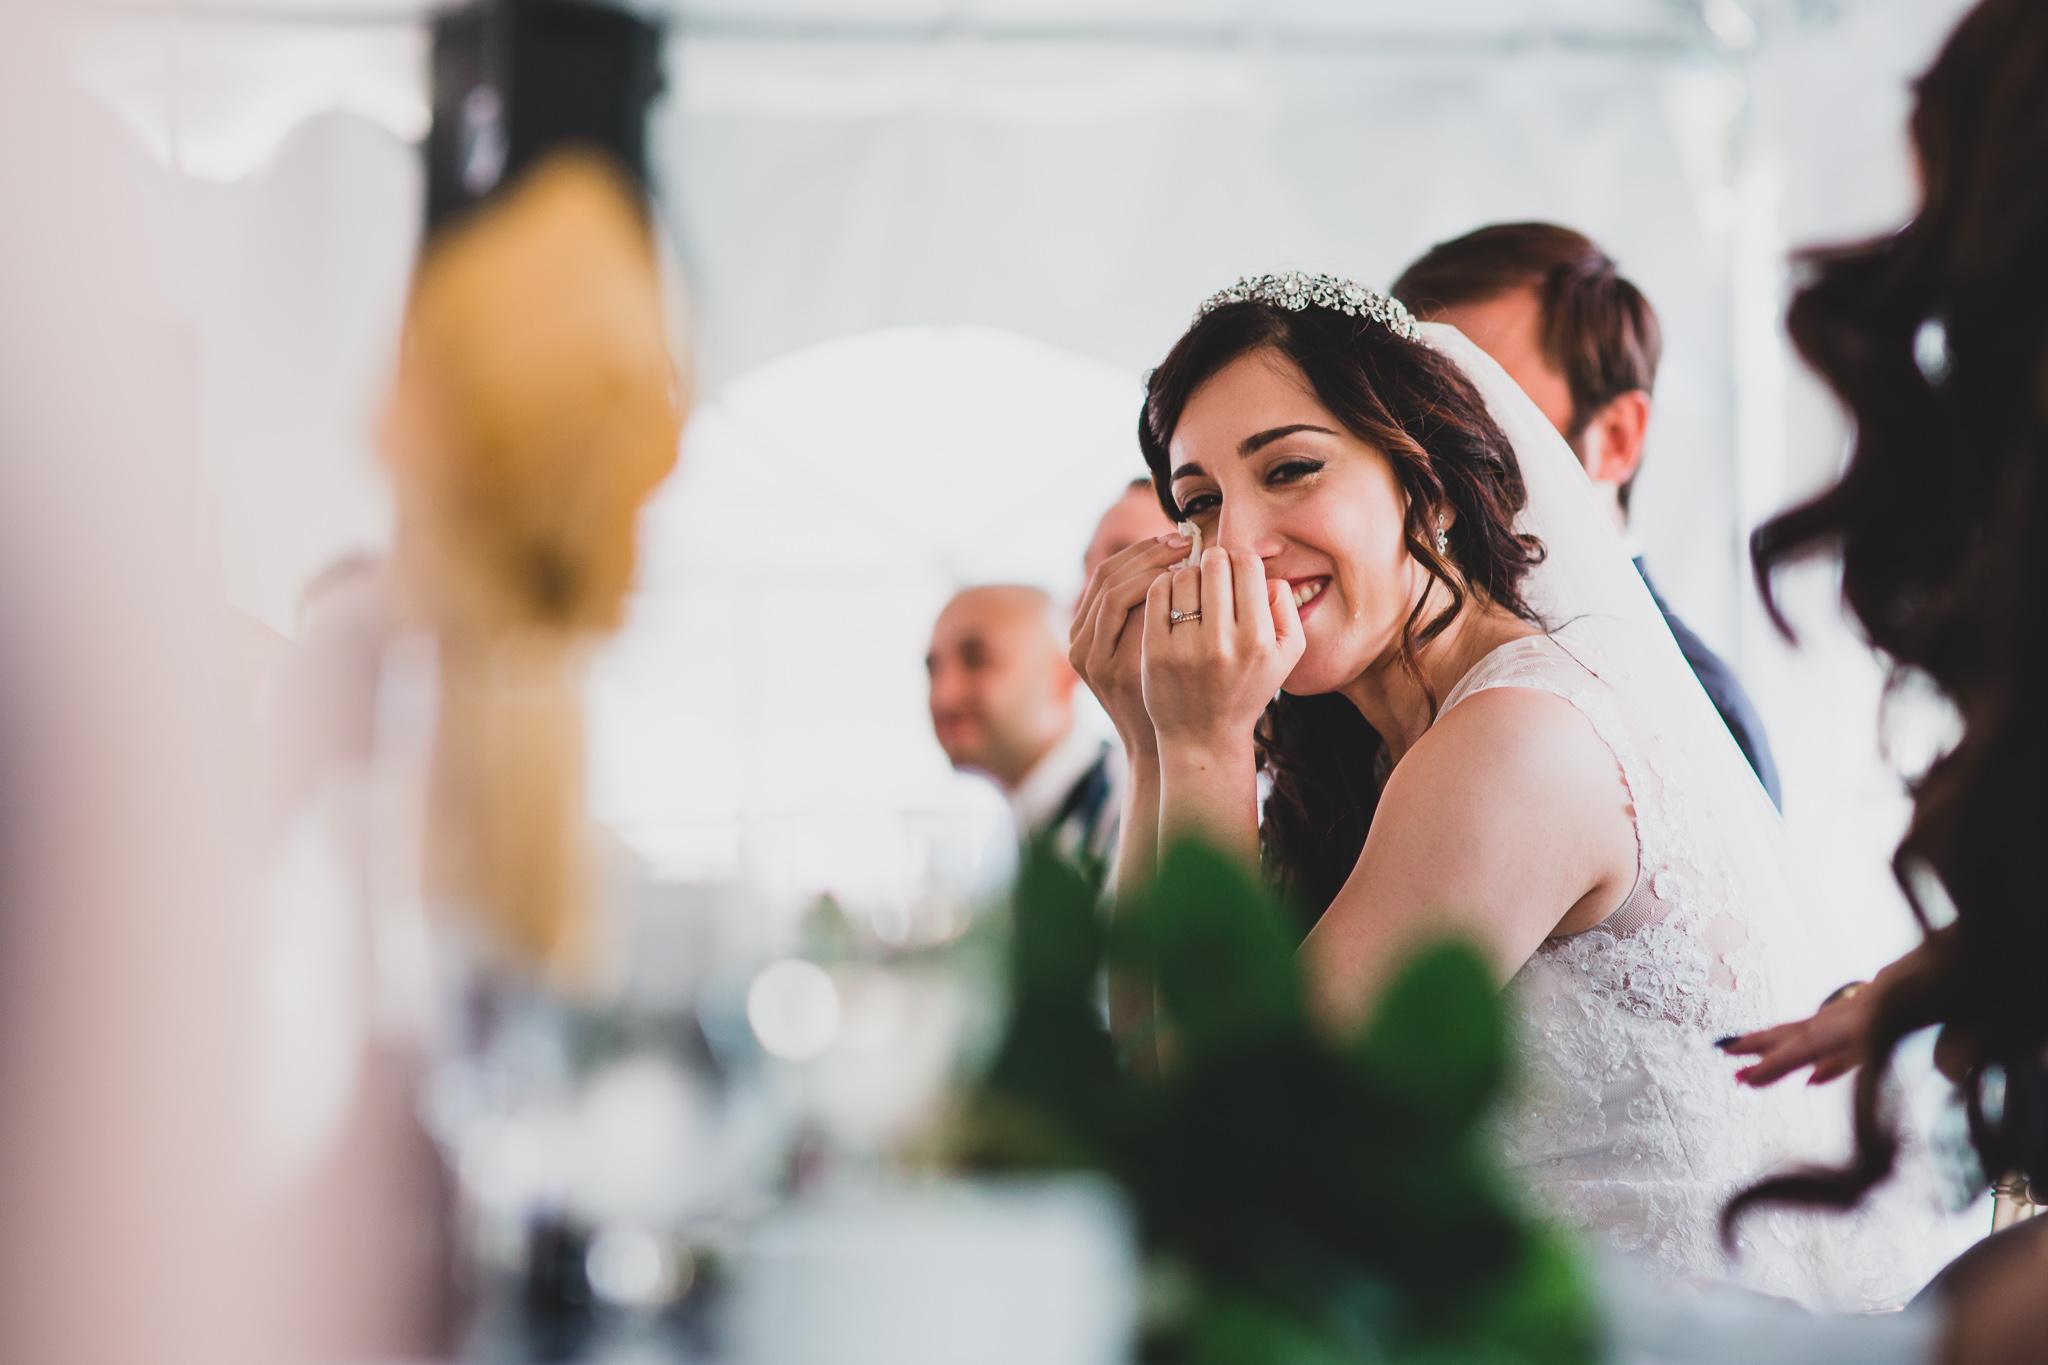 Candid wedding photos, Ottawa photographer